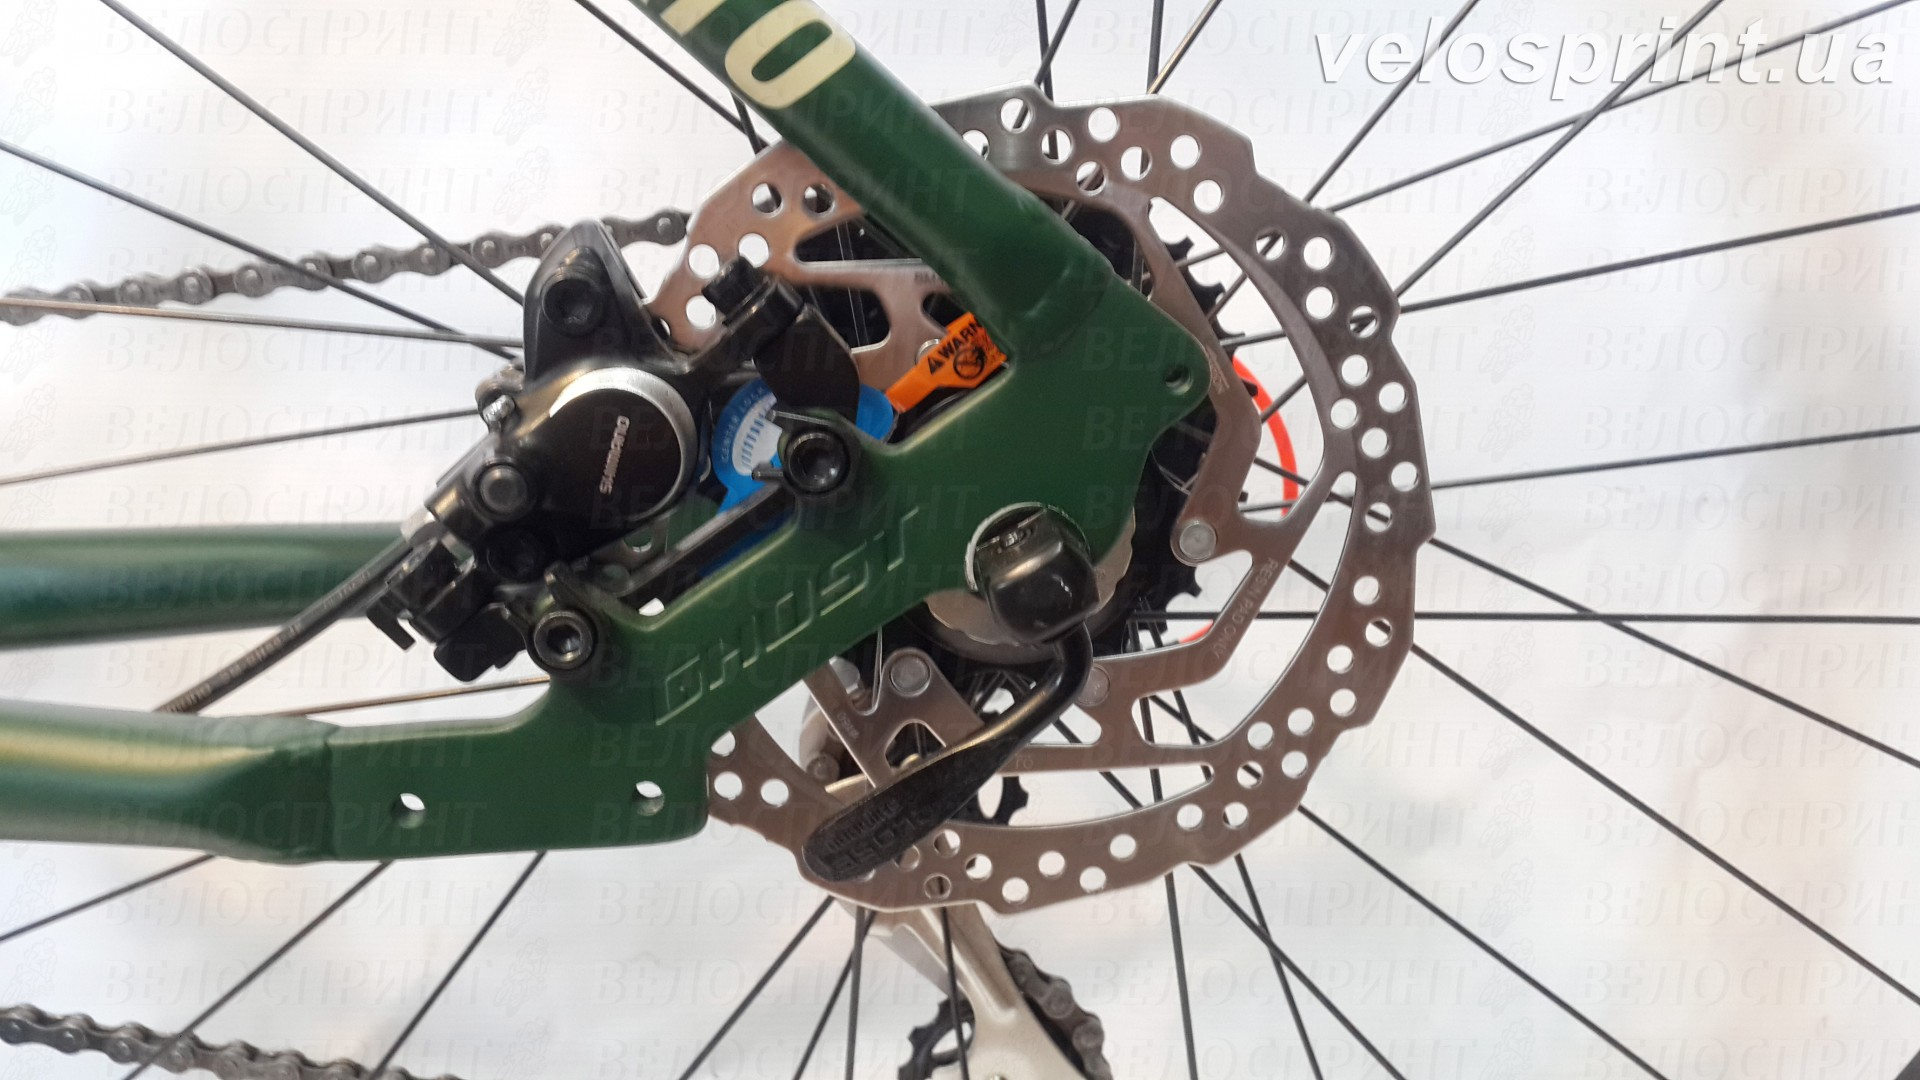 Велосипед GHOST Kato 2 AL 27.5 forestgreen/armygreen/neonred задний тормоз год 2017